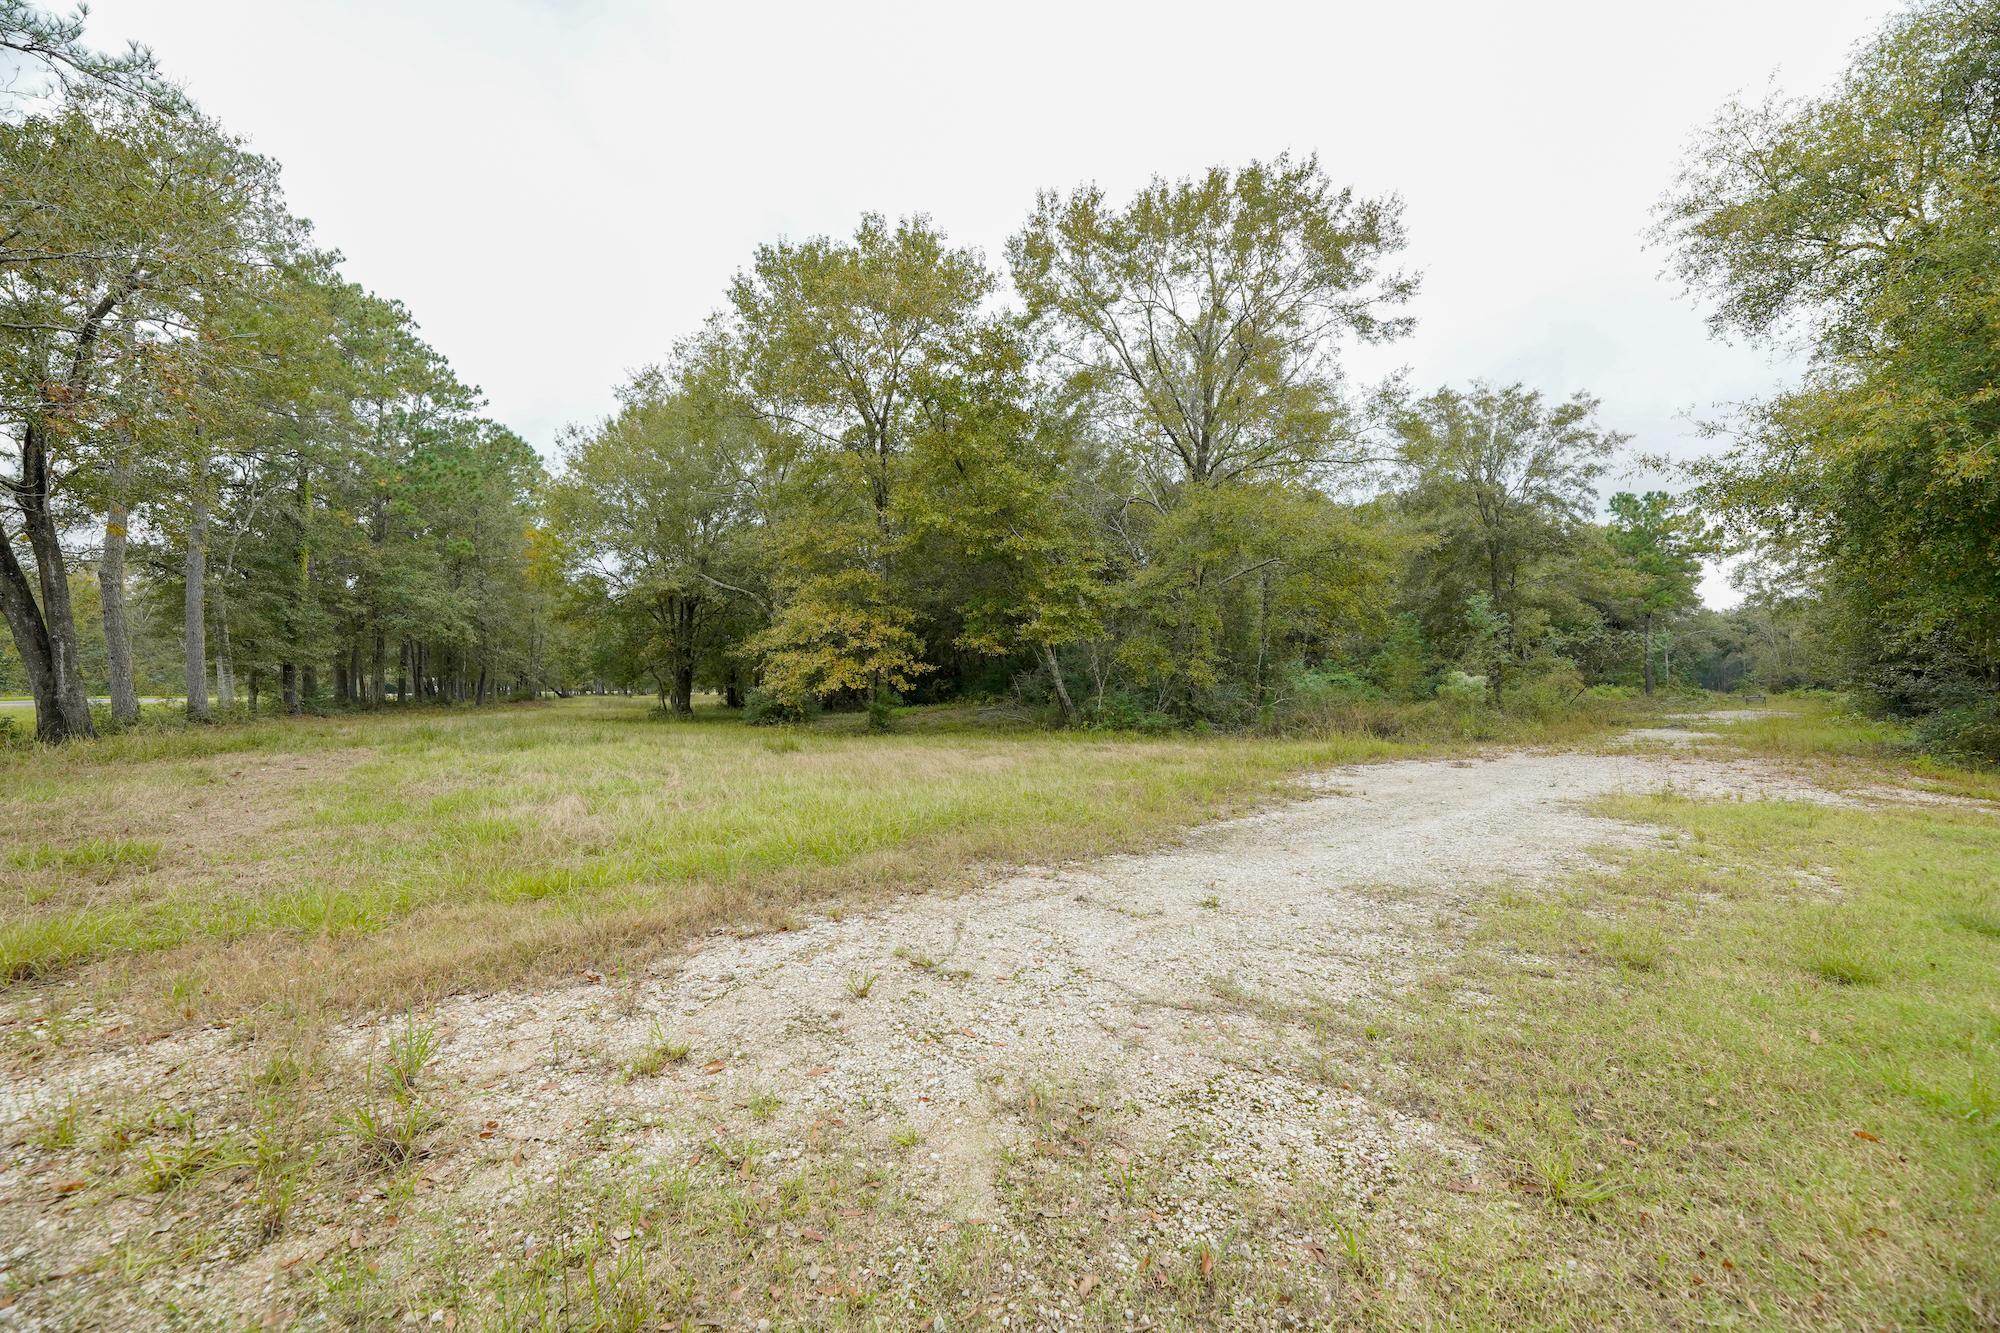 Jefferson County Development Land - Image 32 of 36